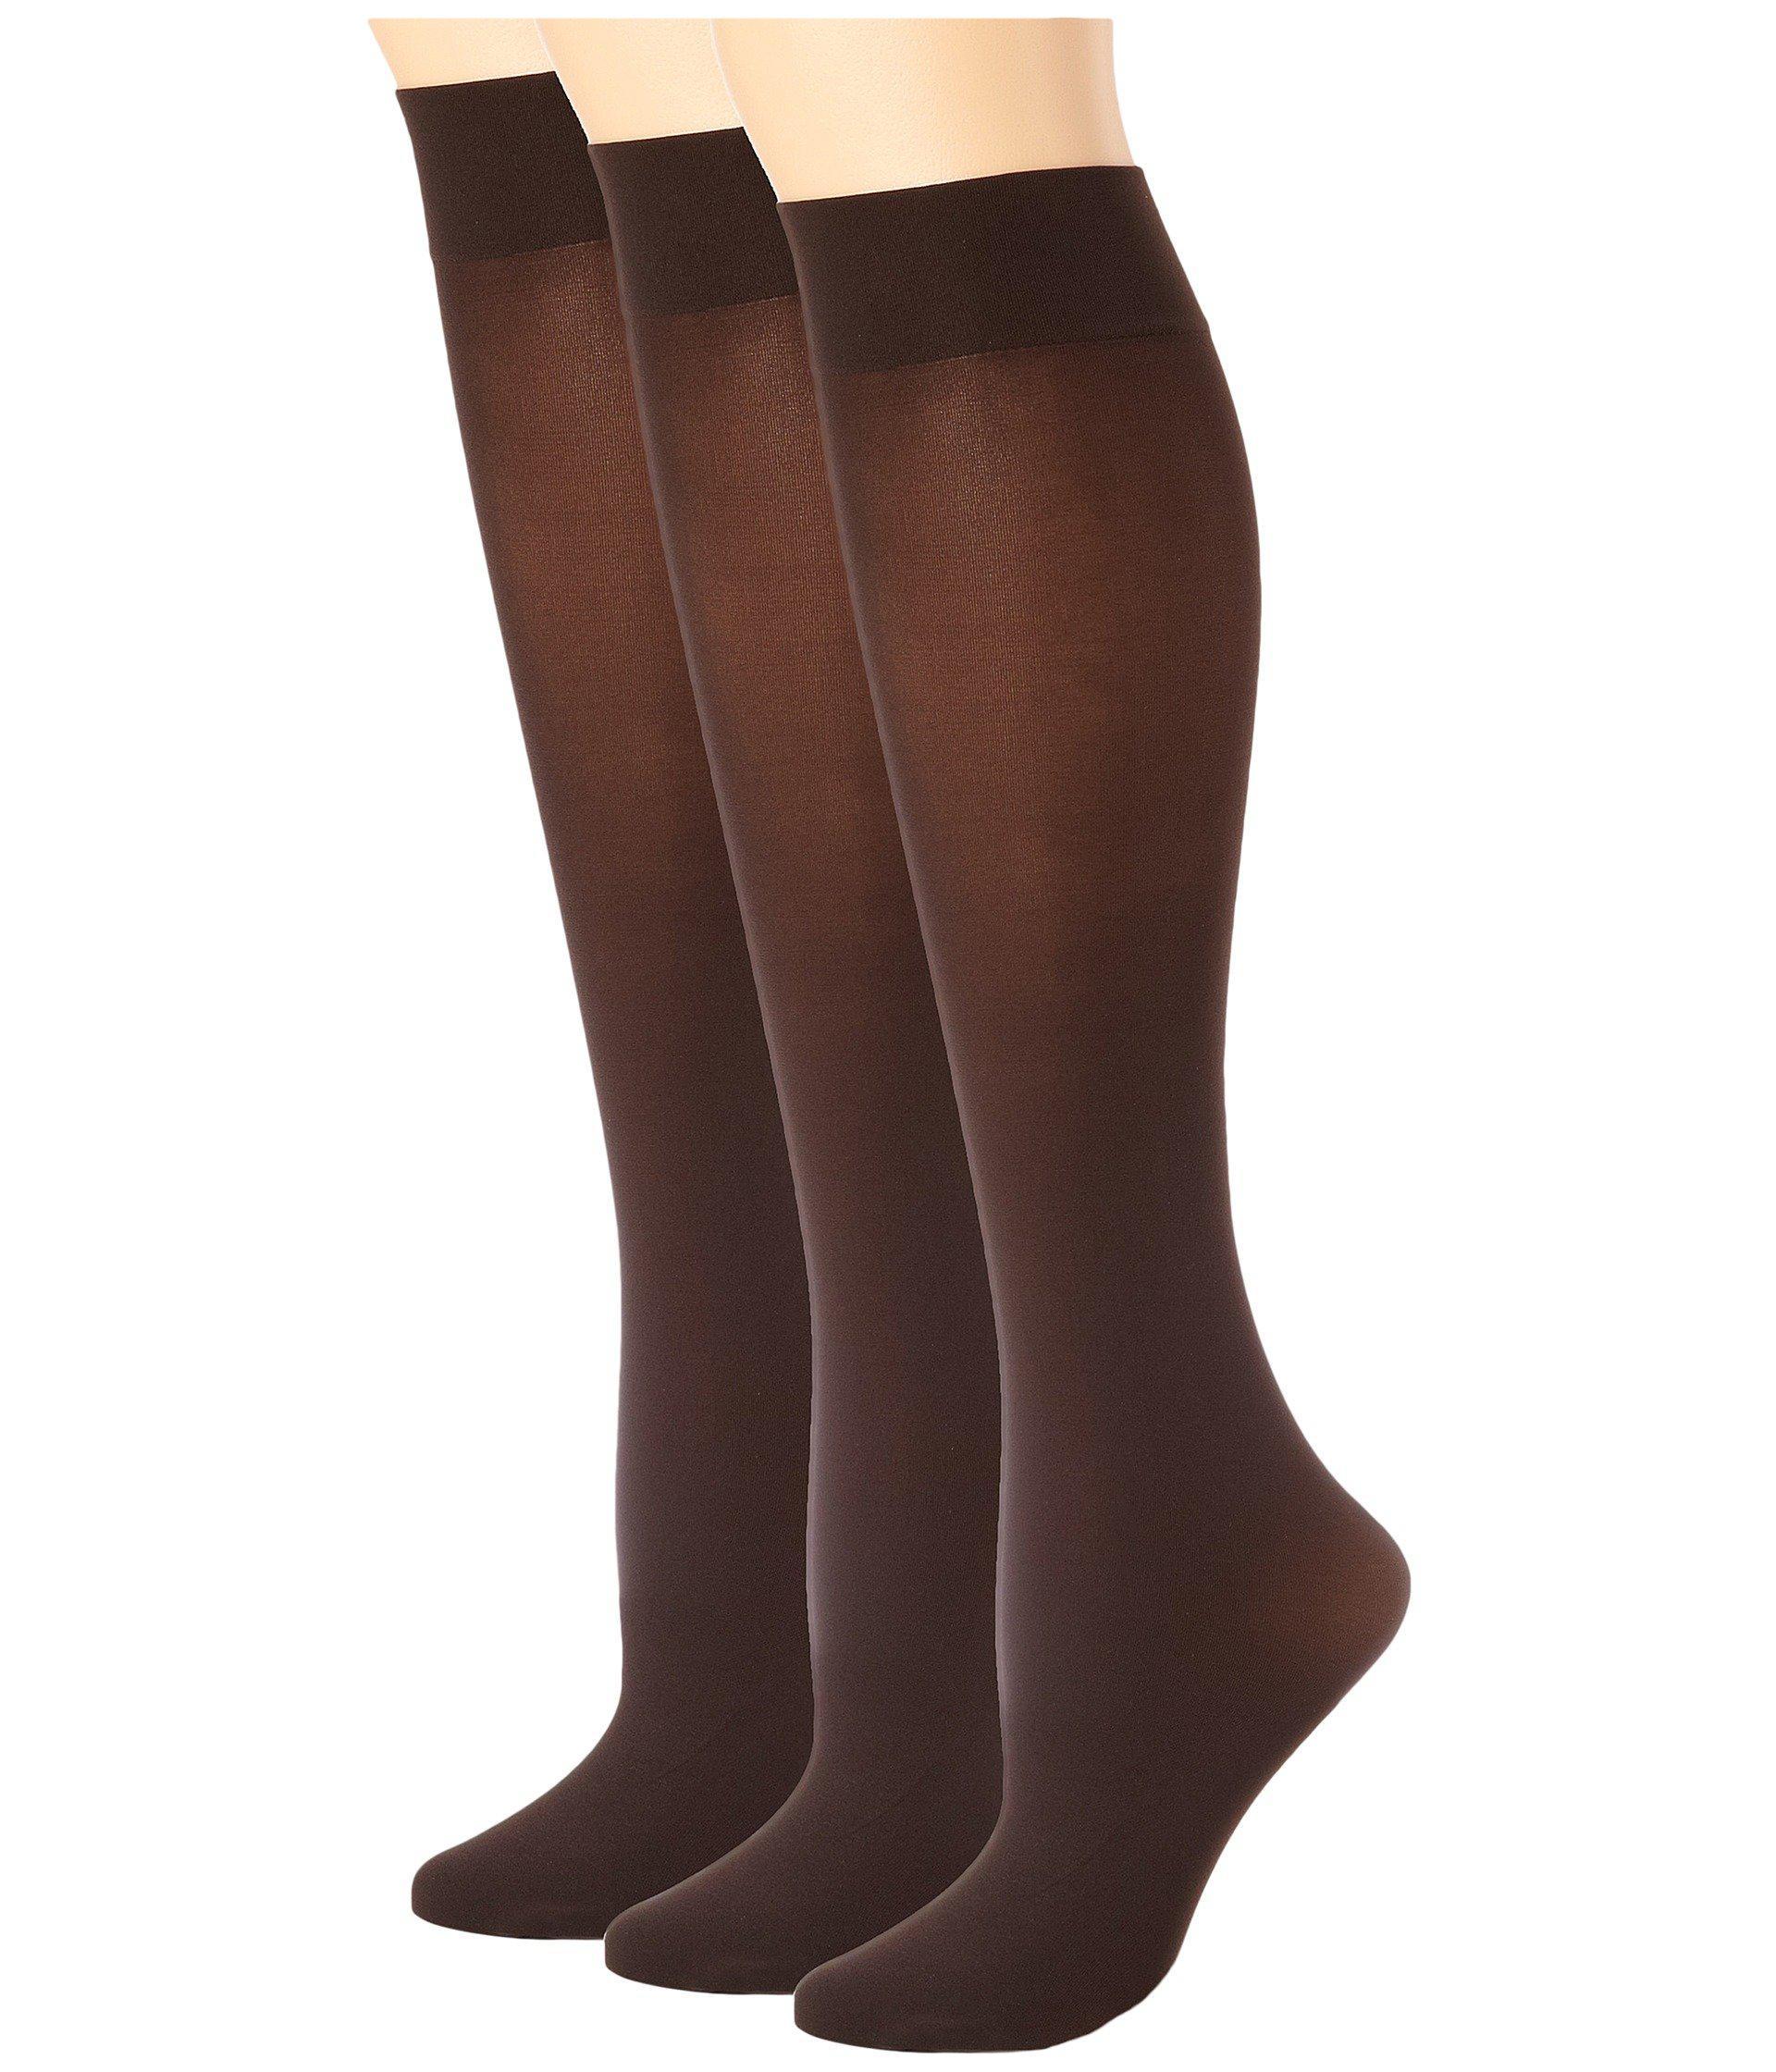 12aceb8a43b Hue. Brown Soft Opaque Knee High 3-pack (espresso) Women s Knee High Socks  Shoes